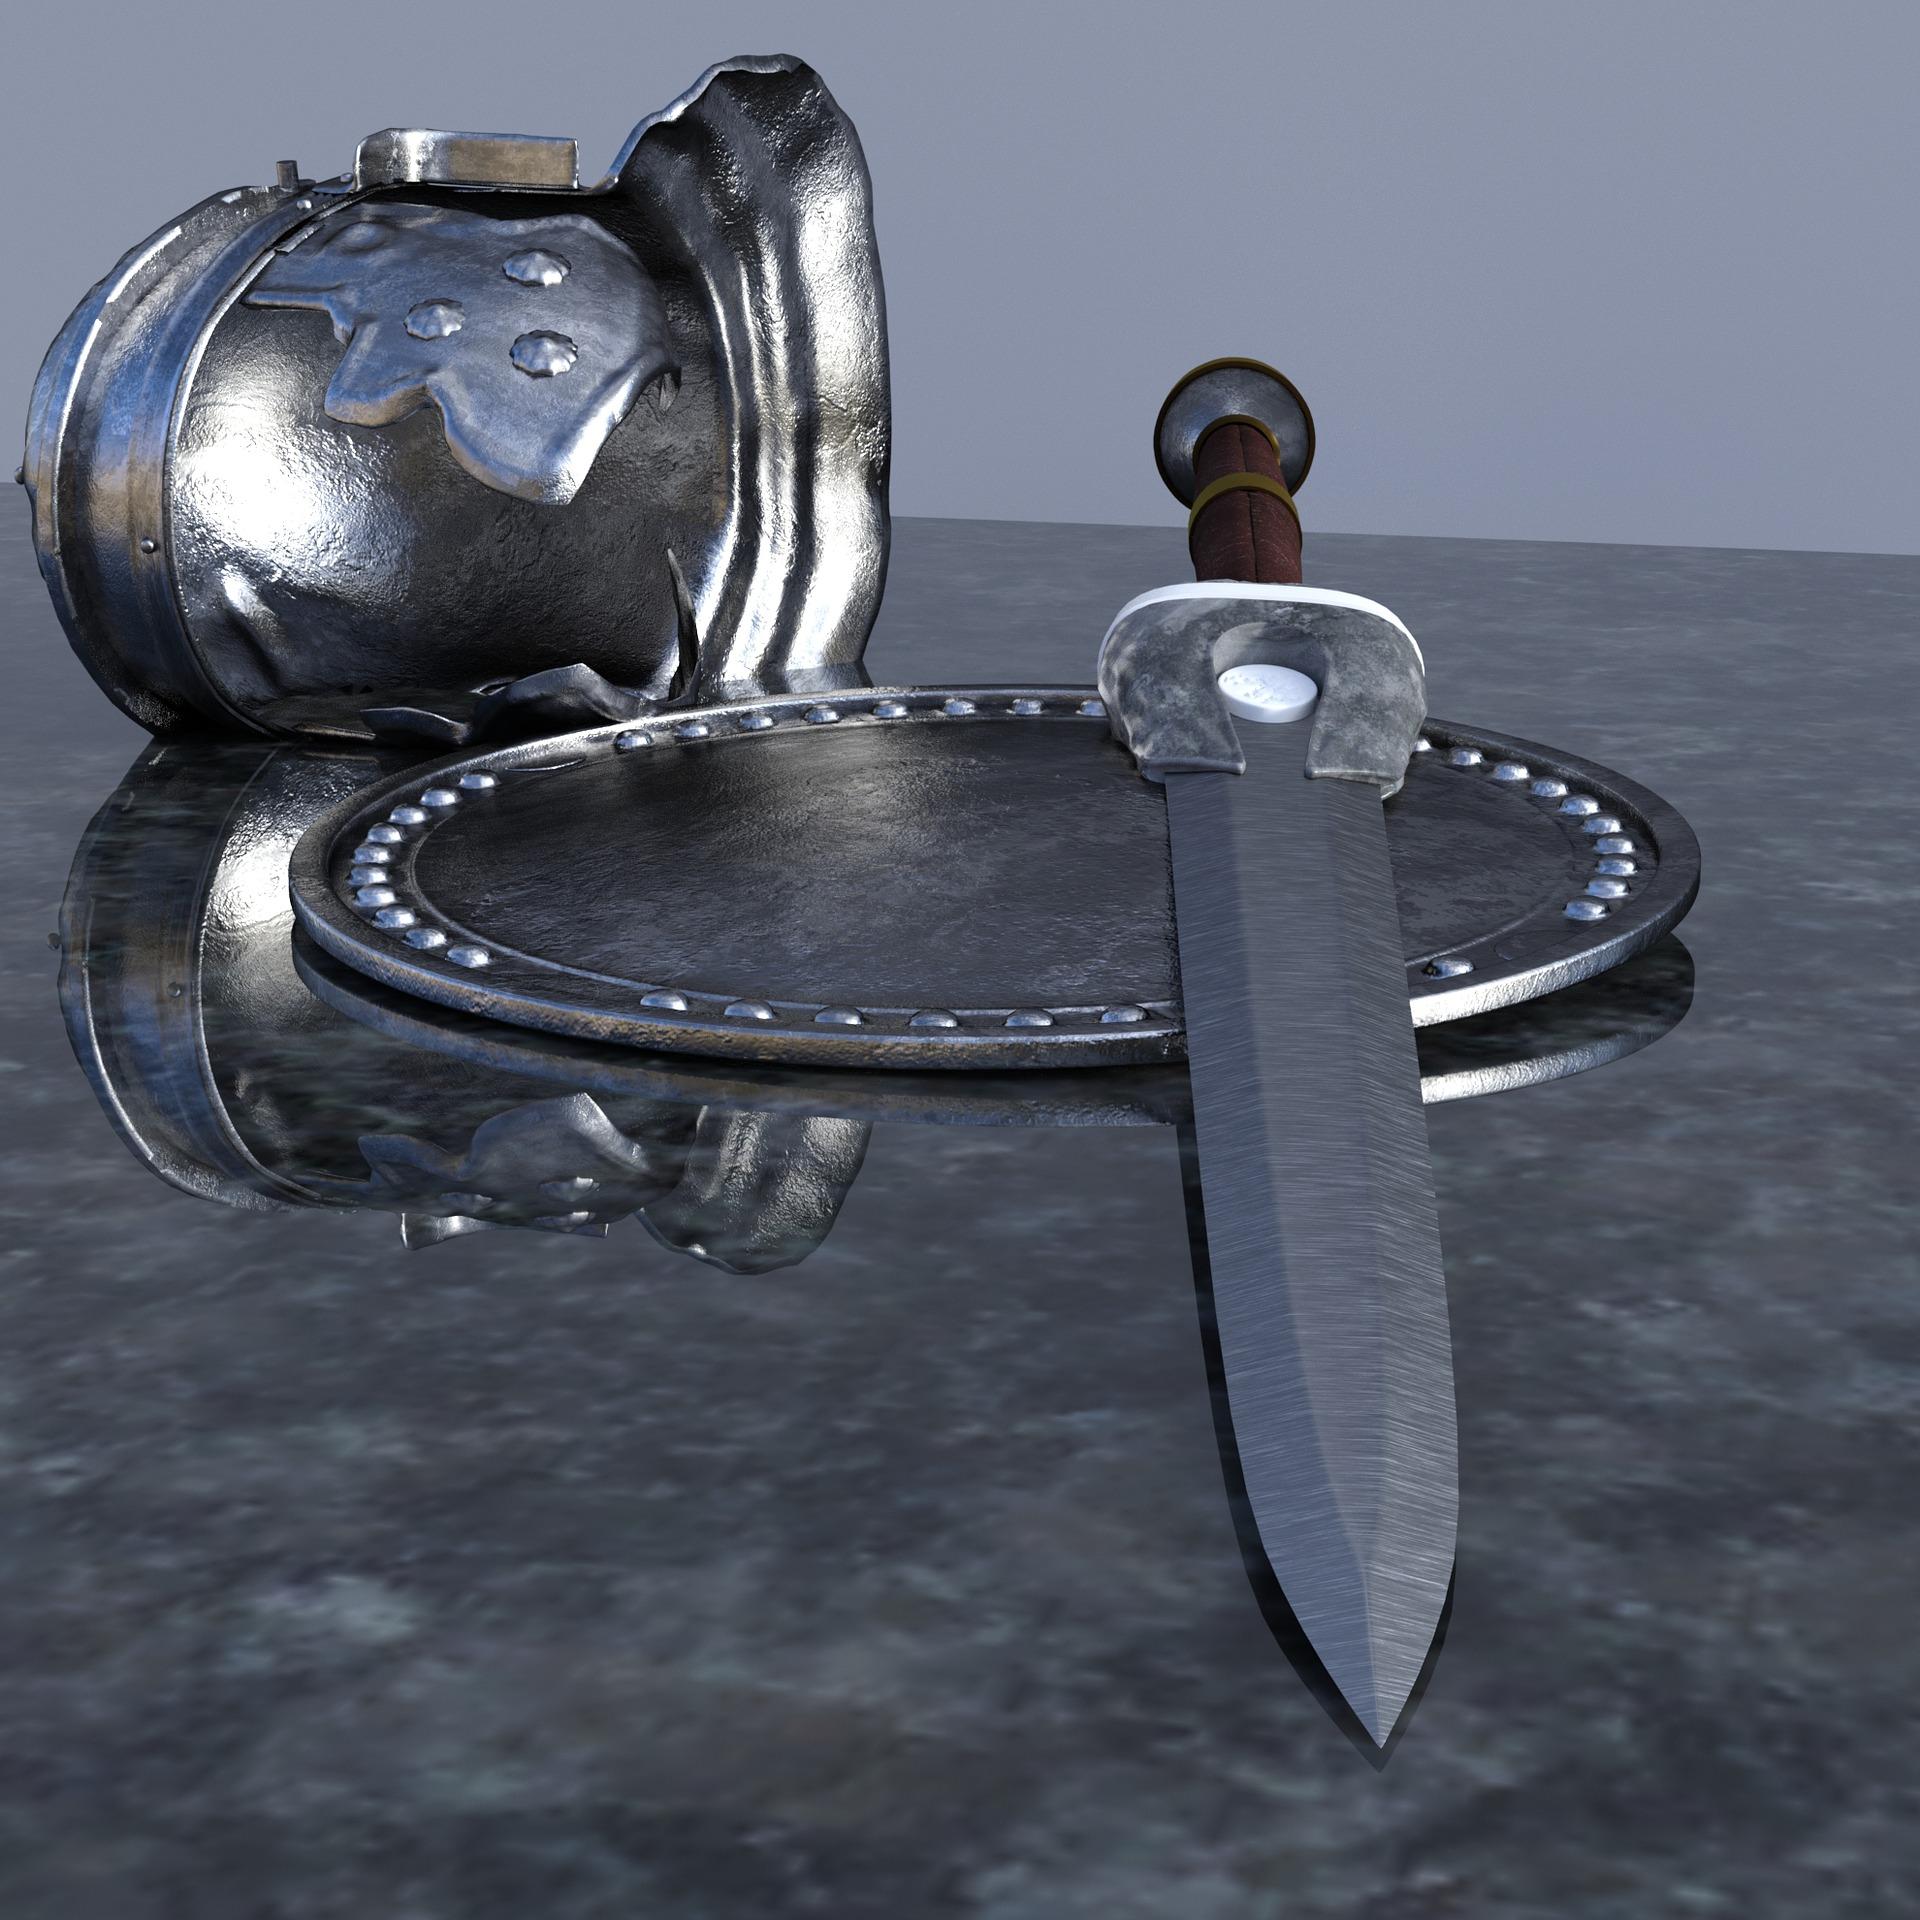 Pixabay - helm, sword, shield